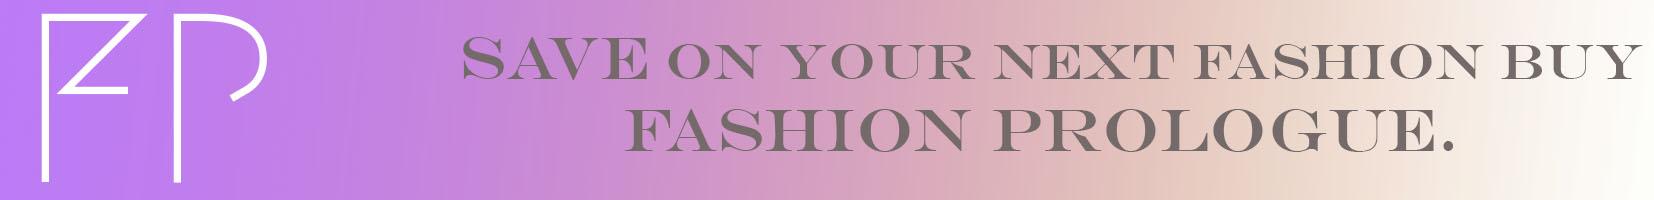 Fashion Prologue - save on fashion banner-purple.jpg